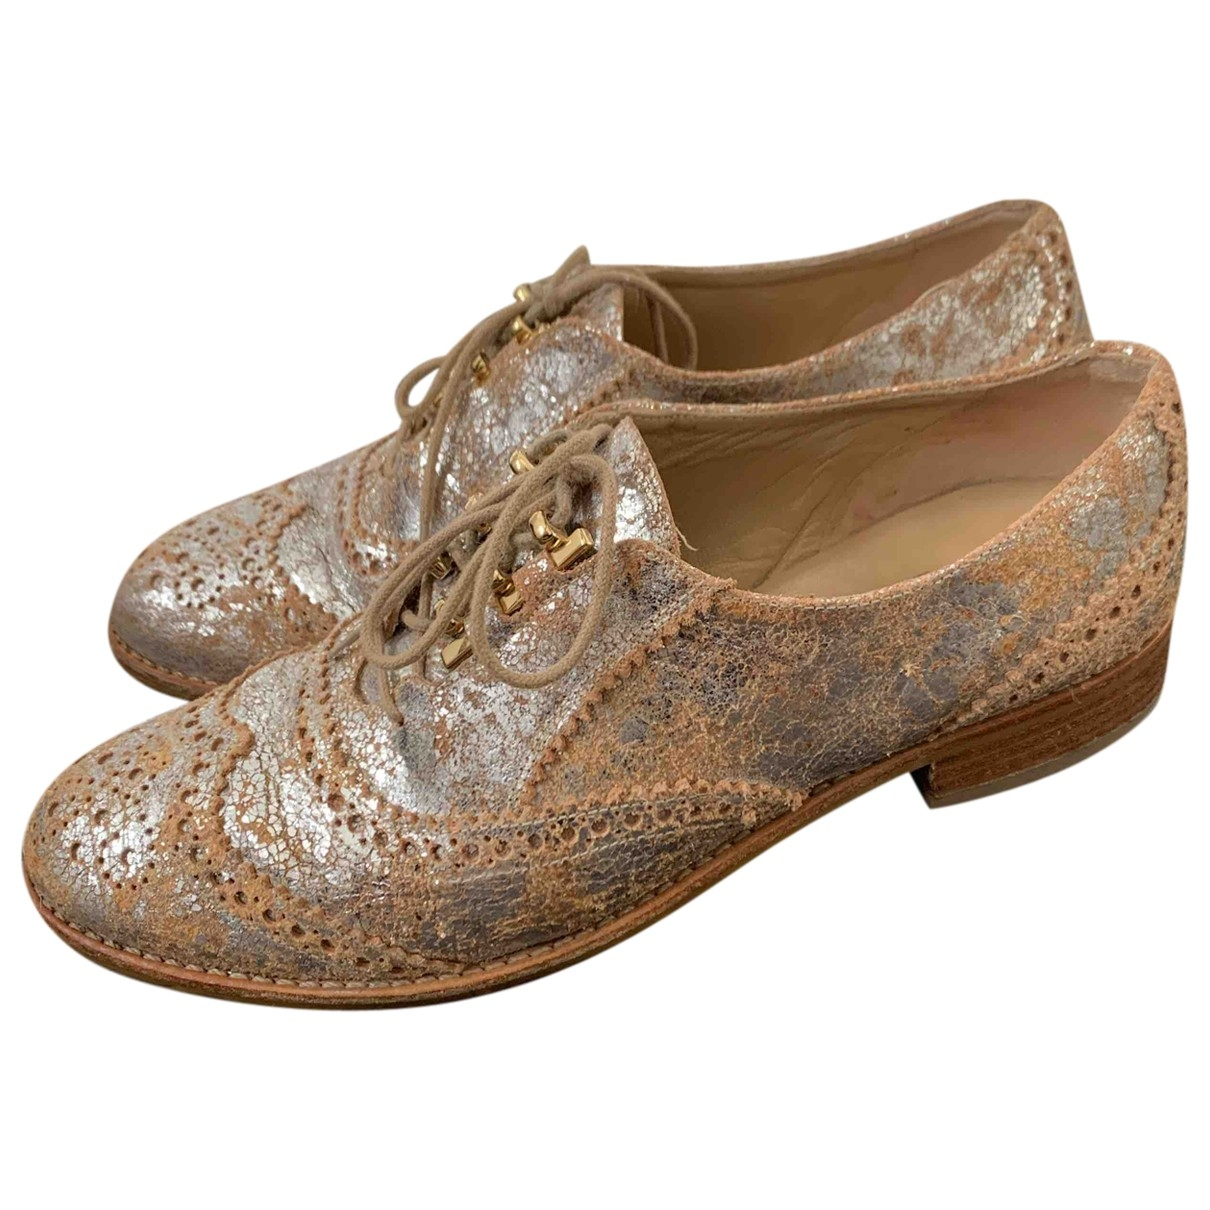 Stuart Weitzman \N Gold Leather Lace ups for Women 37 EU